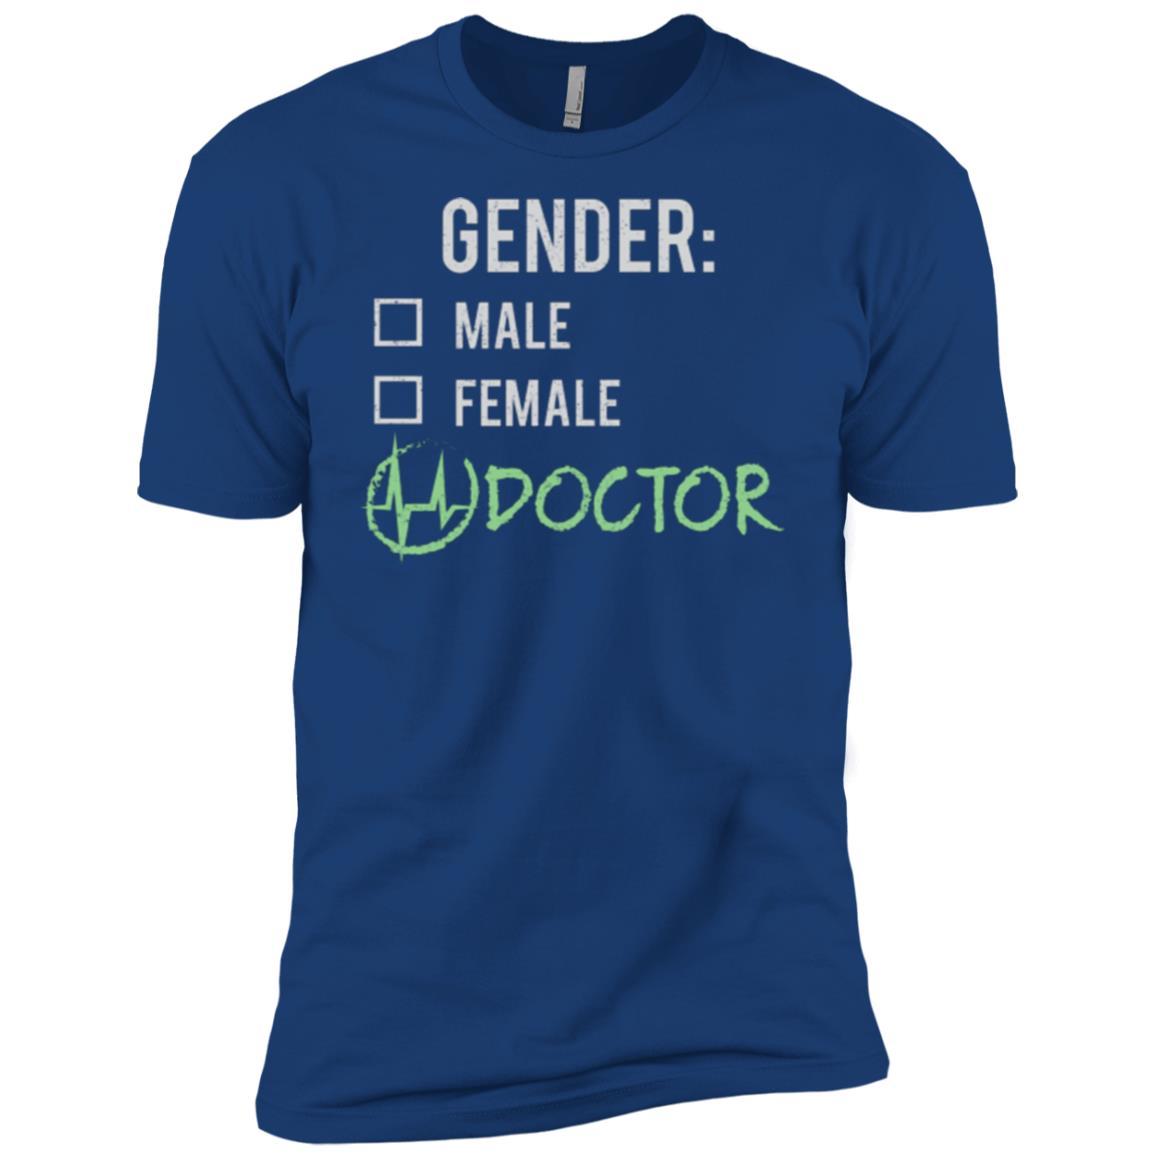 Male Female Doctor Gender Nonbinary Trans Men Short Sleeve T-Shirt